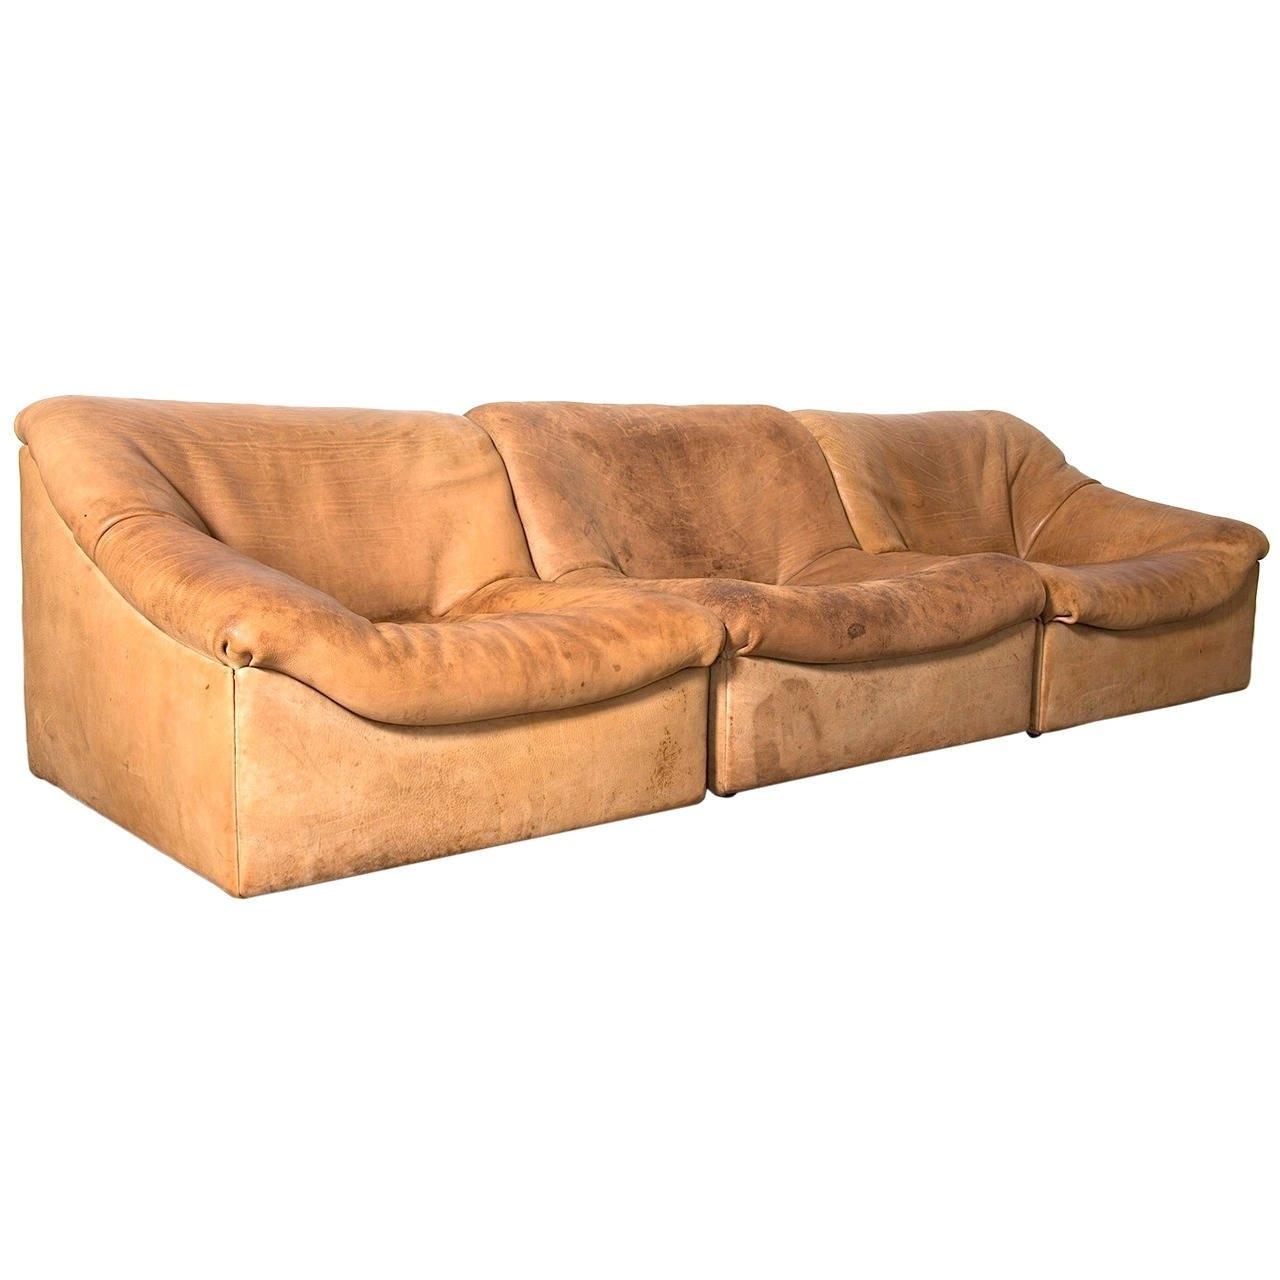 Well Liked Sofa : Sofas Buffalo Ny Design Ideas Modern Contemporary To Sofas In Sectional Sofas At Buffalo Ny (View 14 of 15)